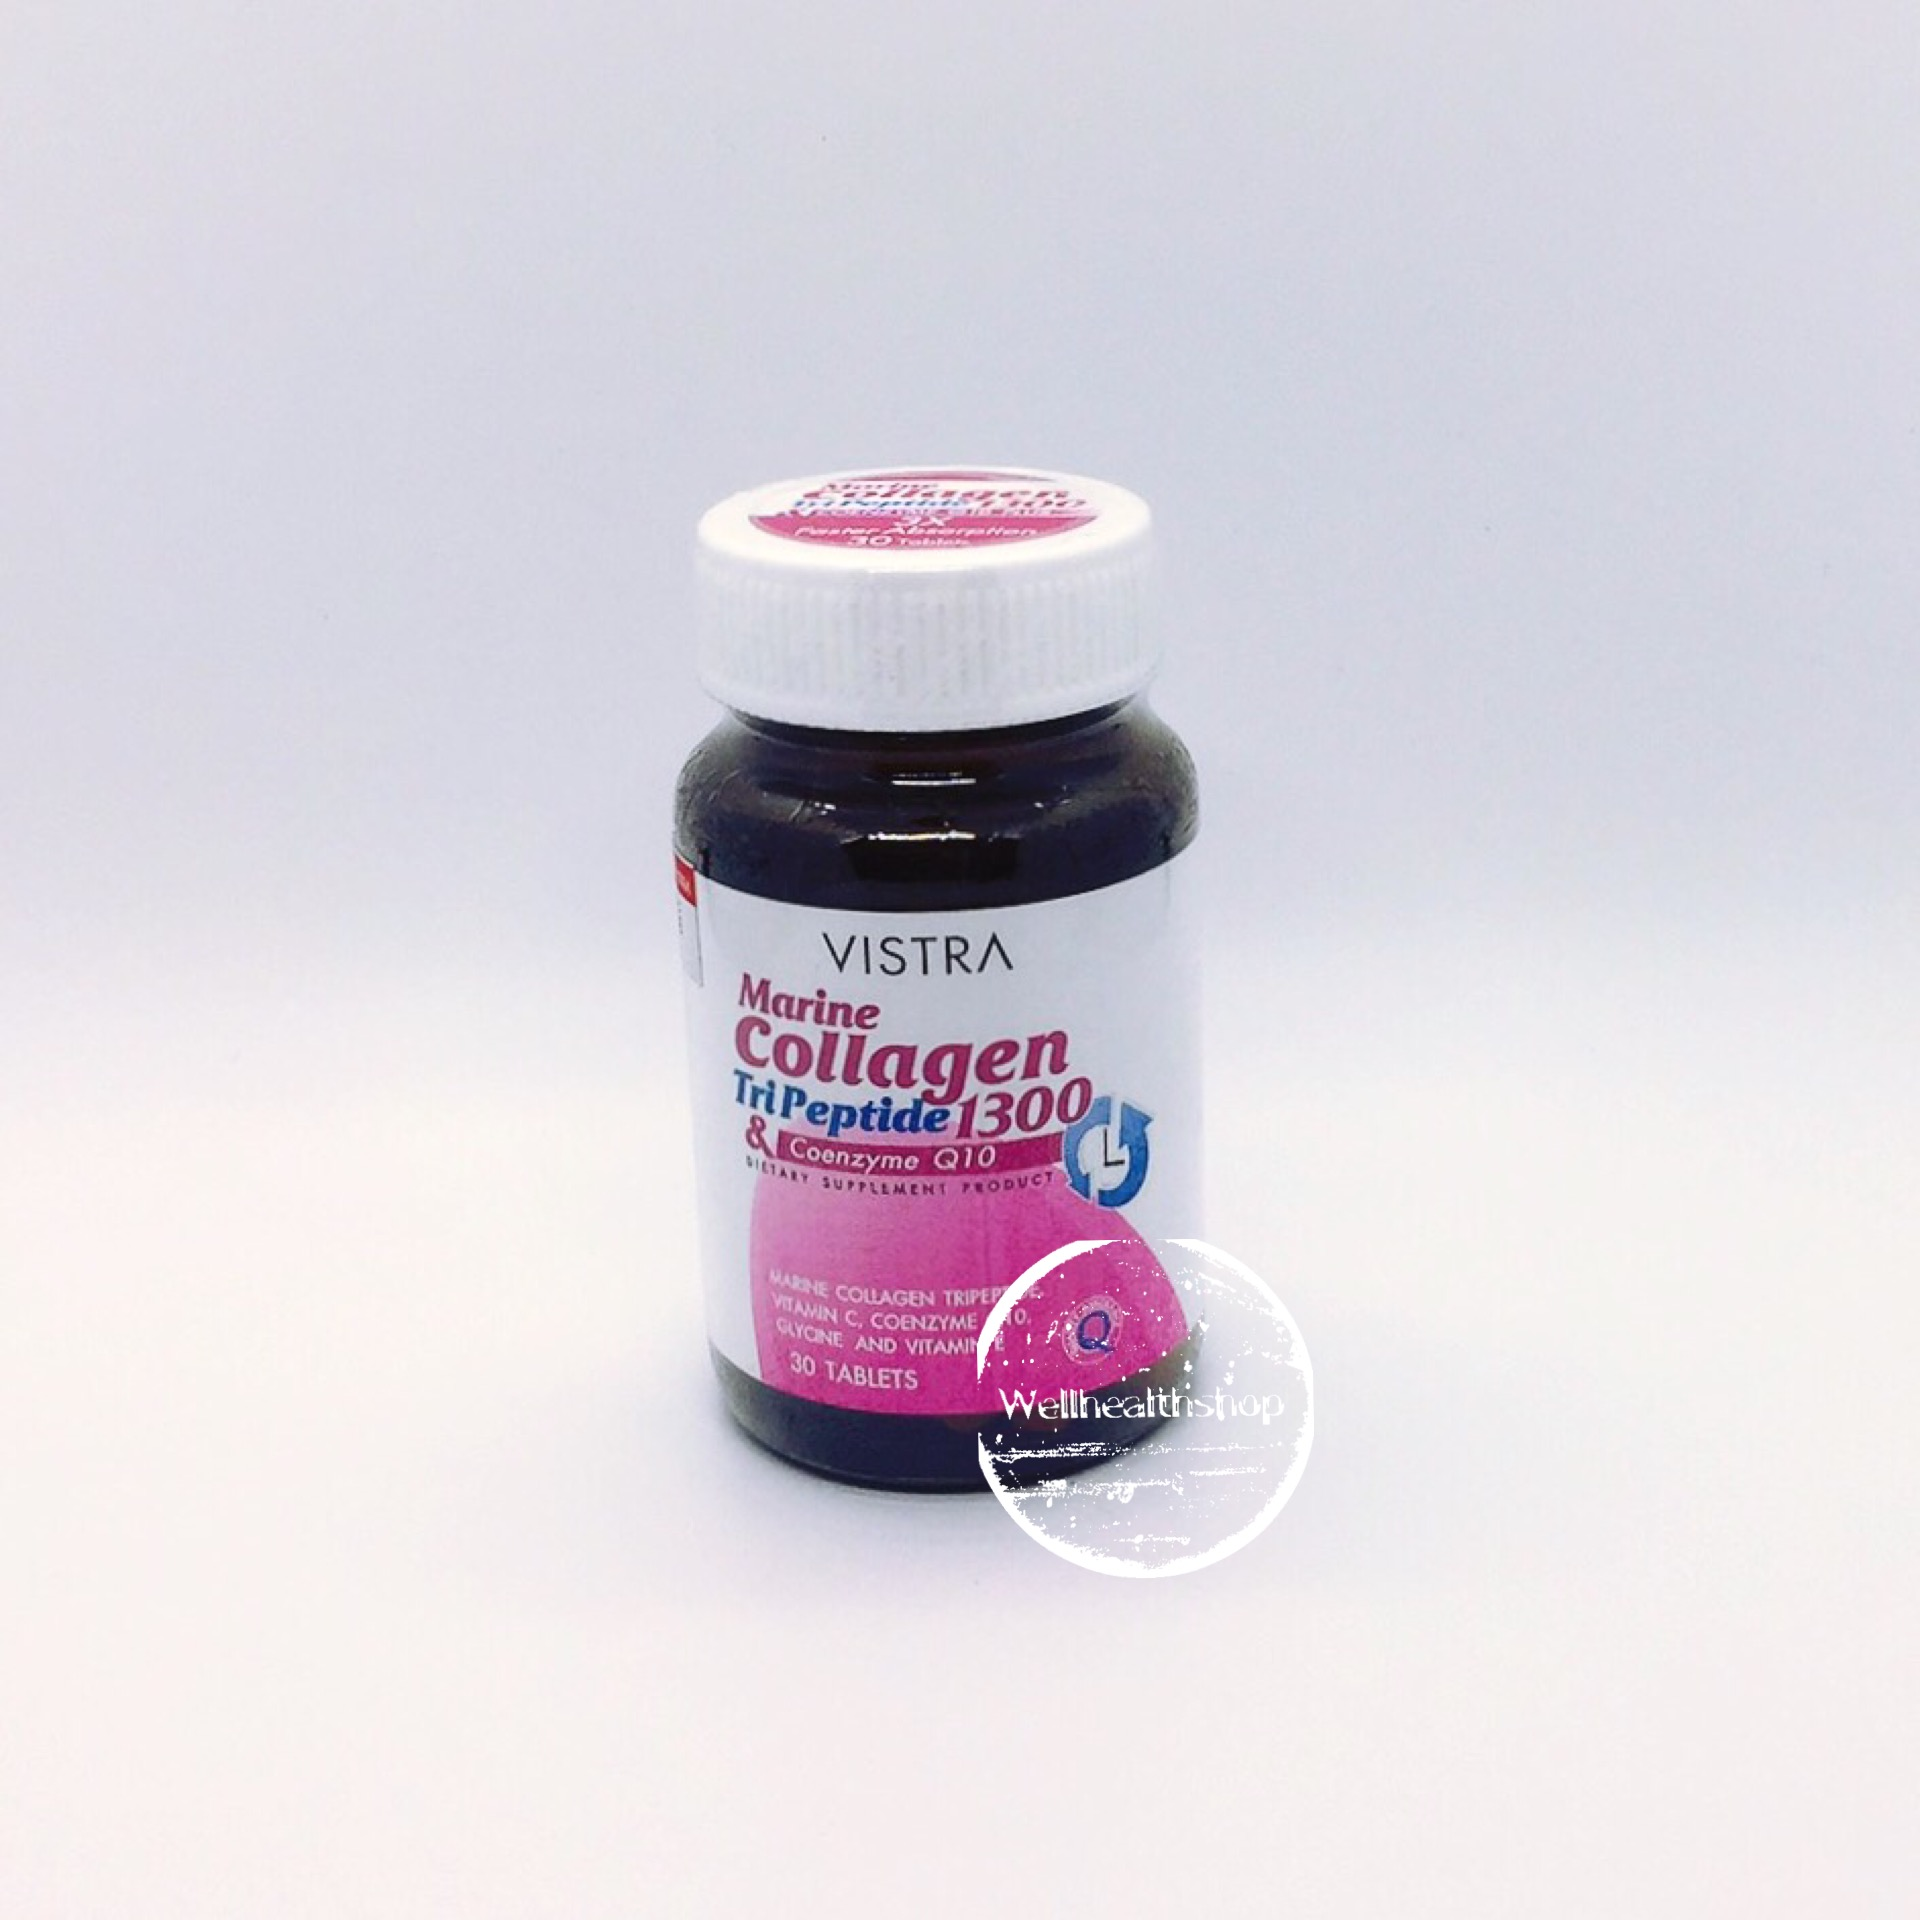 Vistra Marine Collagen Tripeptide 1300 & Coenzyme Q10 วิสทร้า มารีน คอลลาเจน ไตรเปปไทด์ แอนด์ โคเอ็นไซม์ คิวเท็น